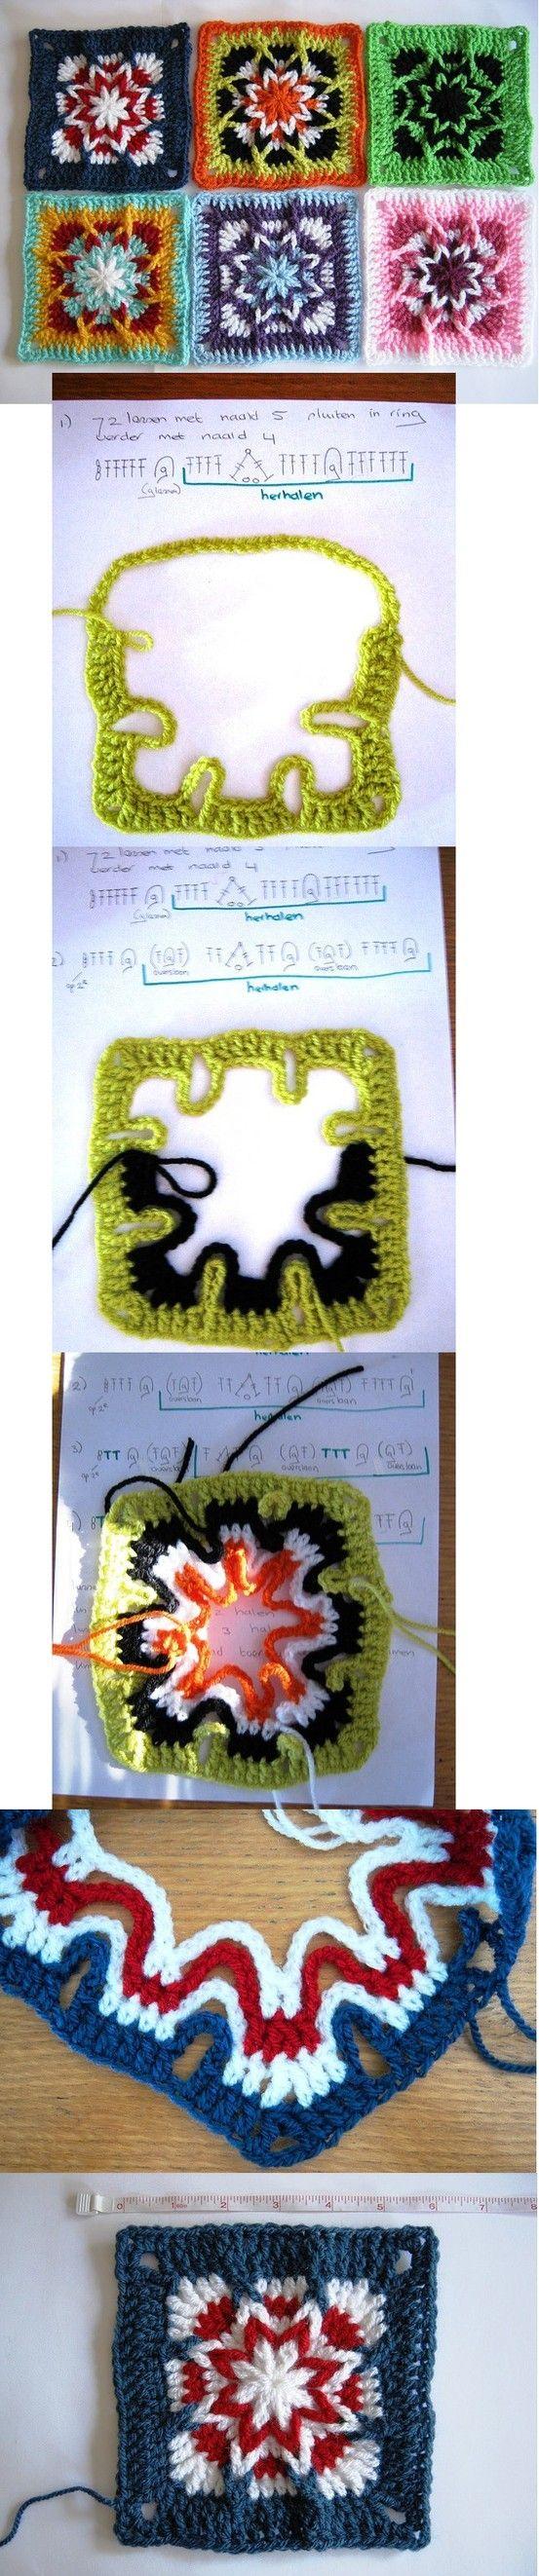 interesting technique for this crochet granny square!!!